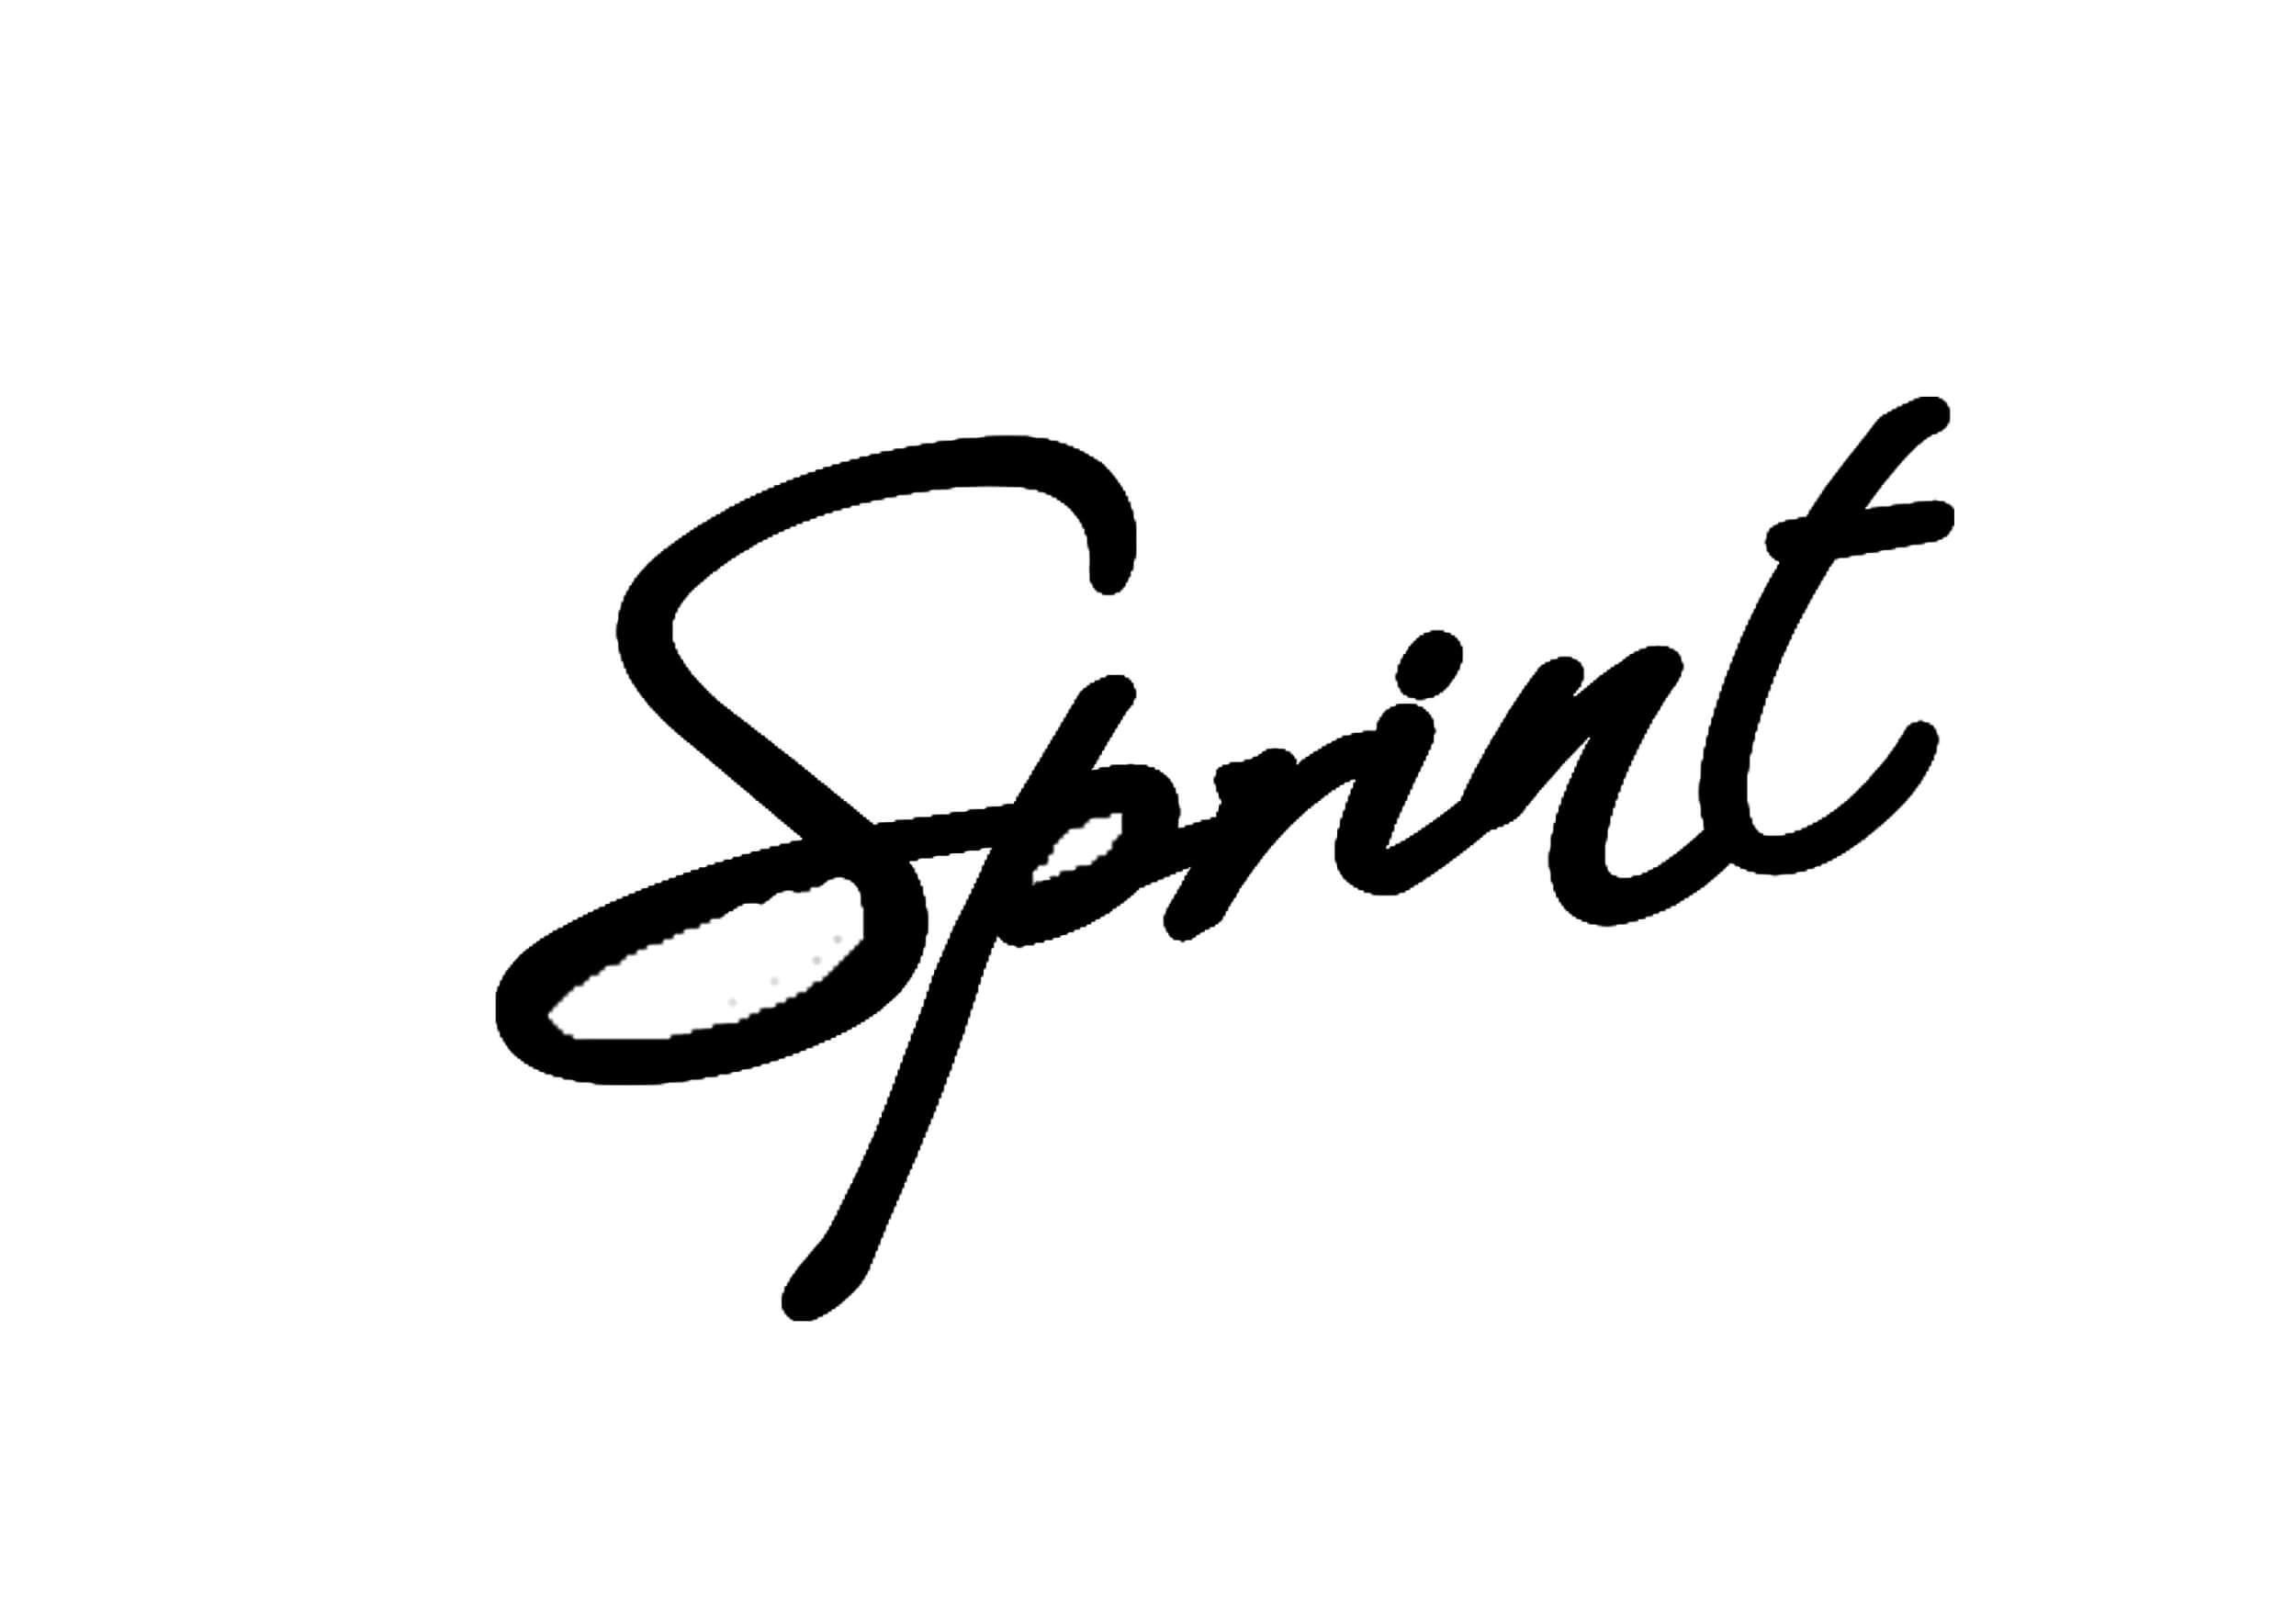 comprar-motos-sprint-logo-motissimo-barcelona